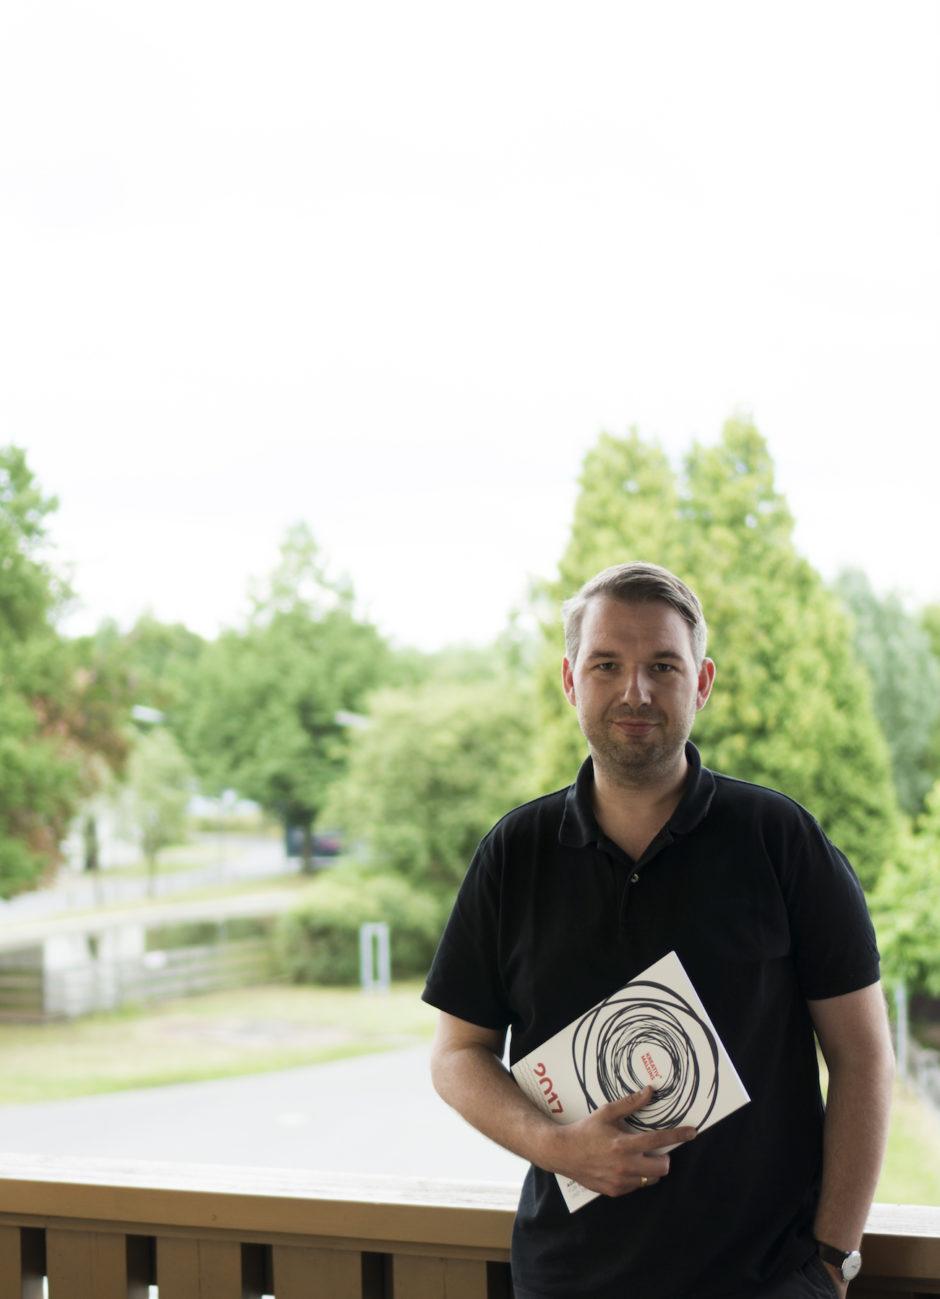 Kreativstandorte Werbeagentur Oberpfalz